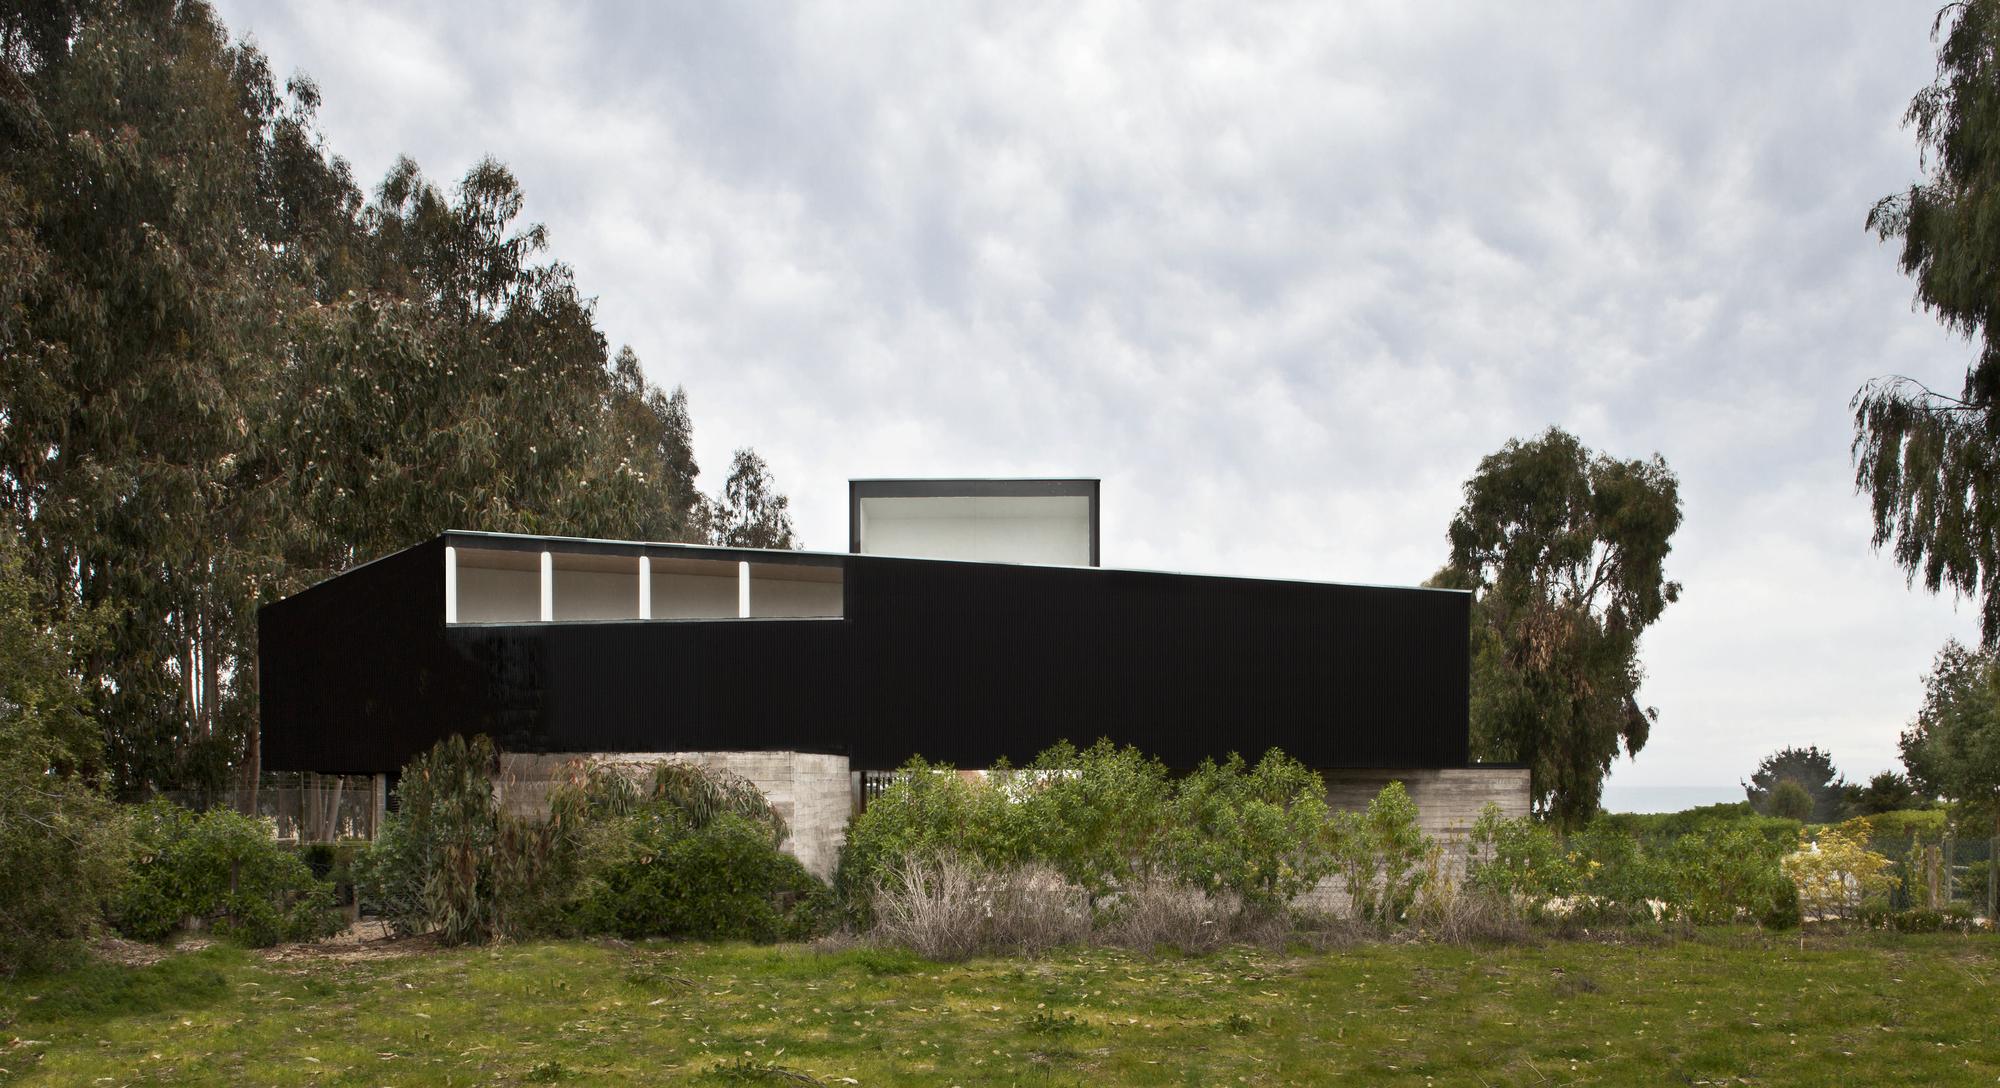 Casa Rock / UN Arquitectura, © Natalia Vial